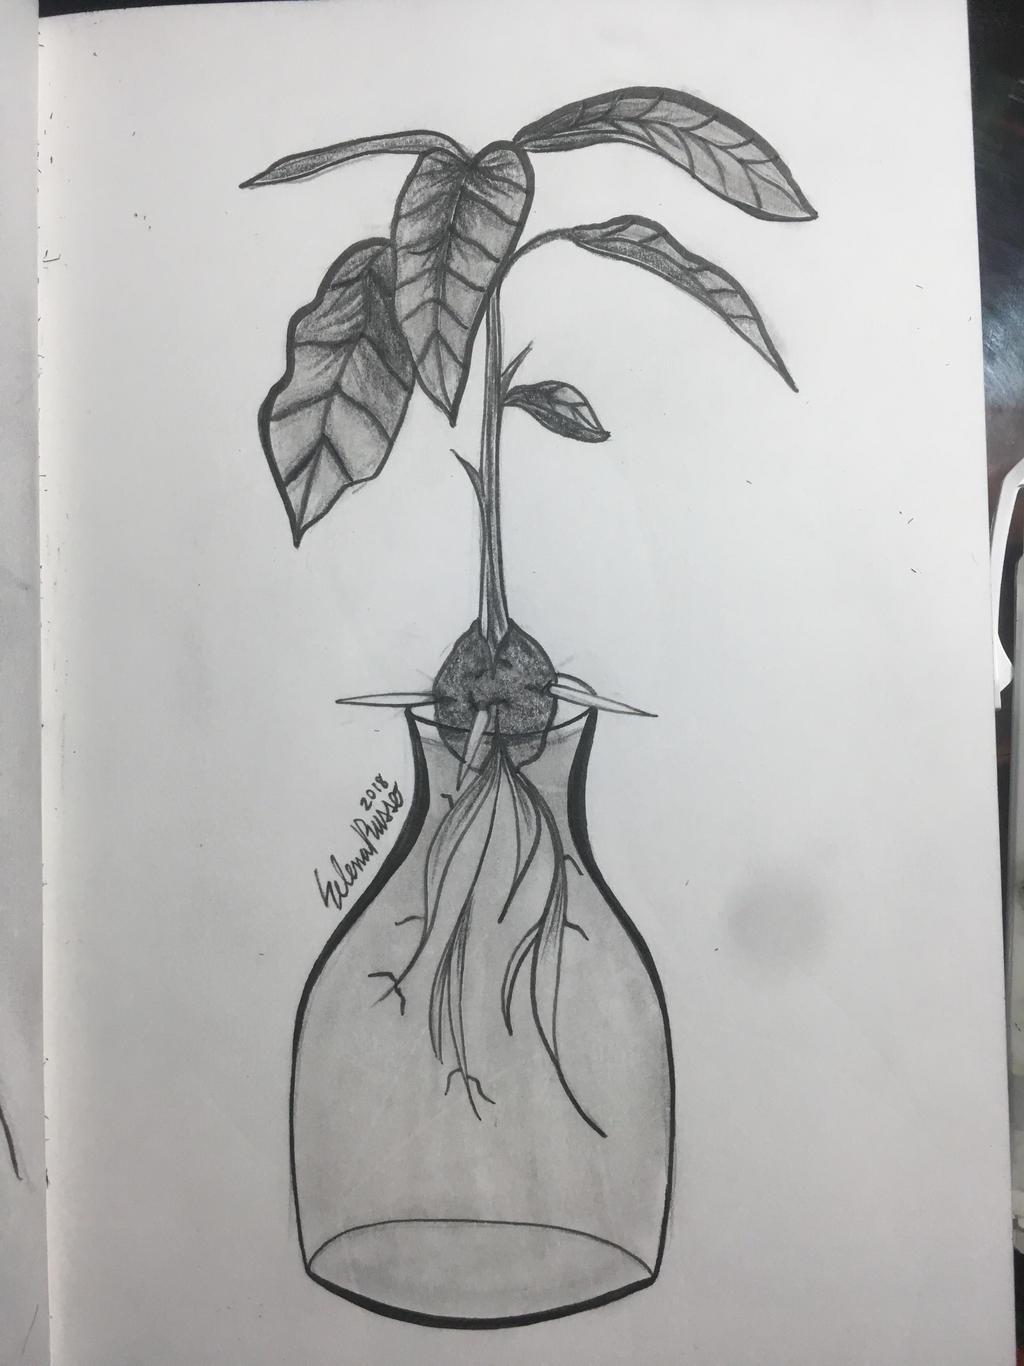 Inktober Day 18: bottle